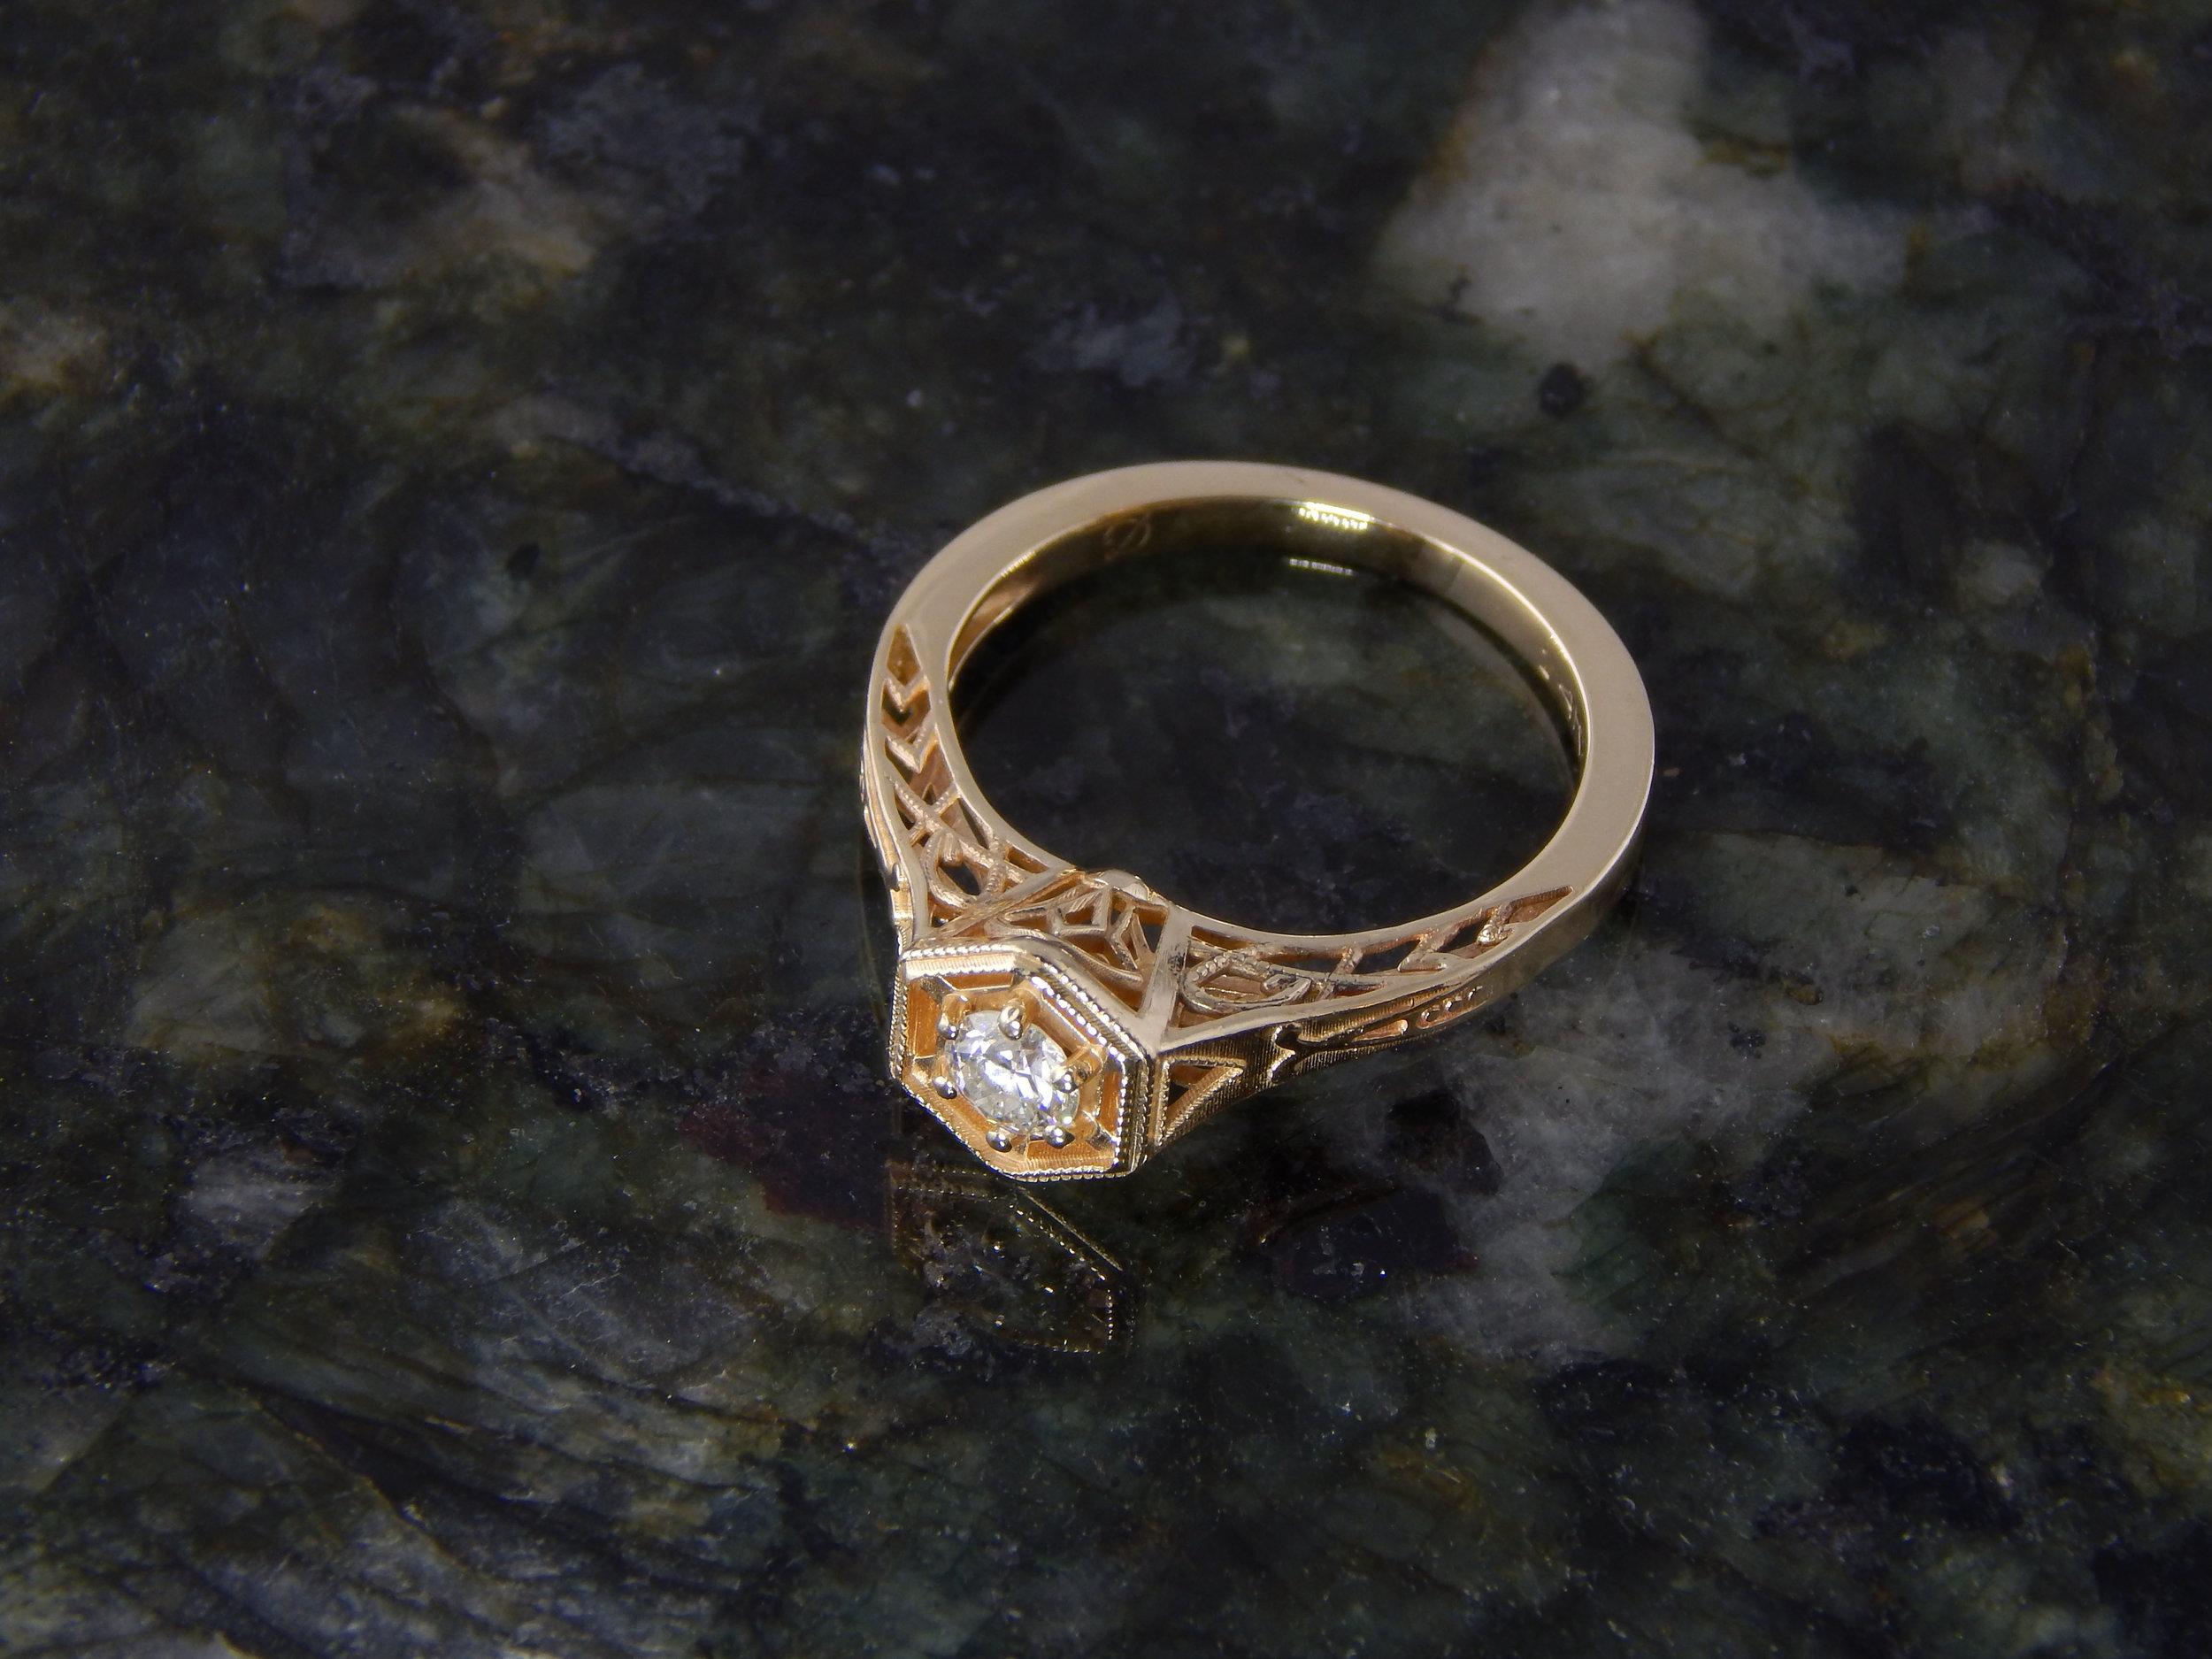 darvier-deco-rose-gold-diamond-ring-gallery-work.JPG